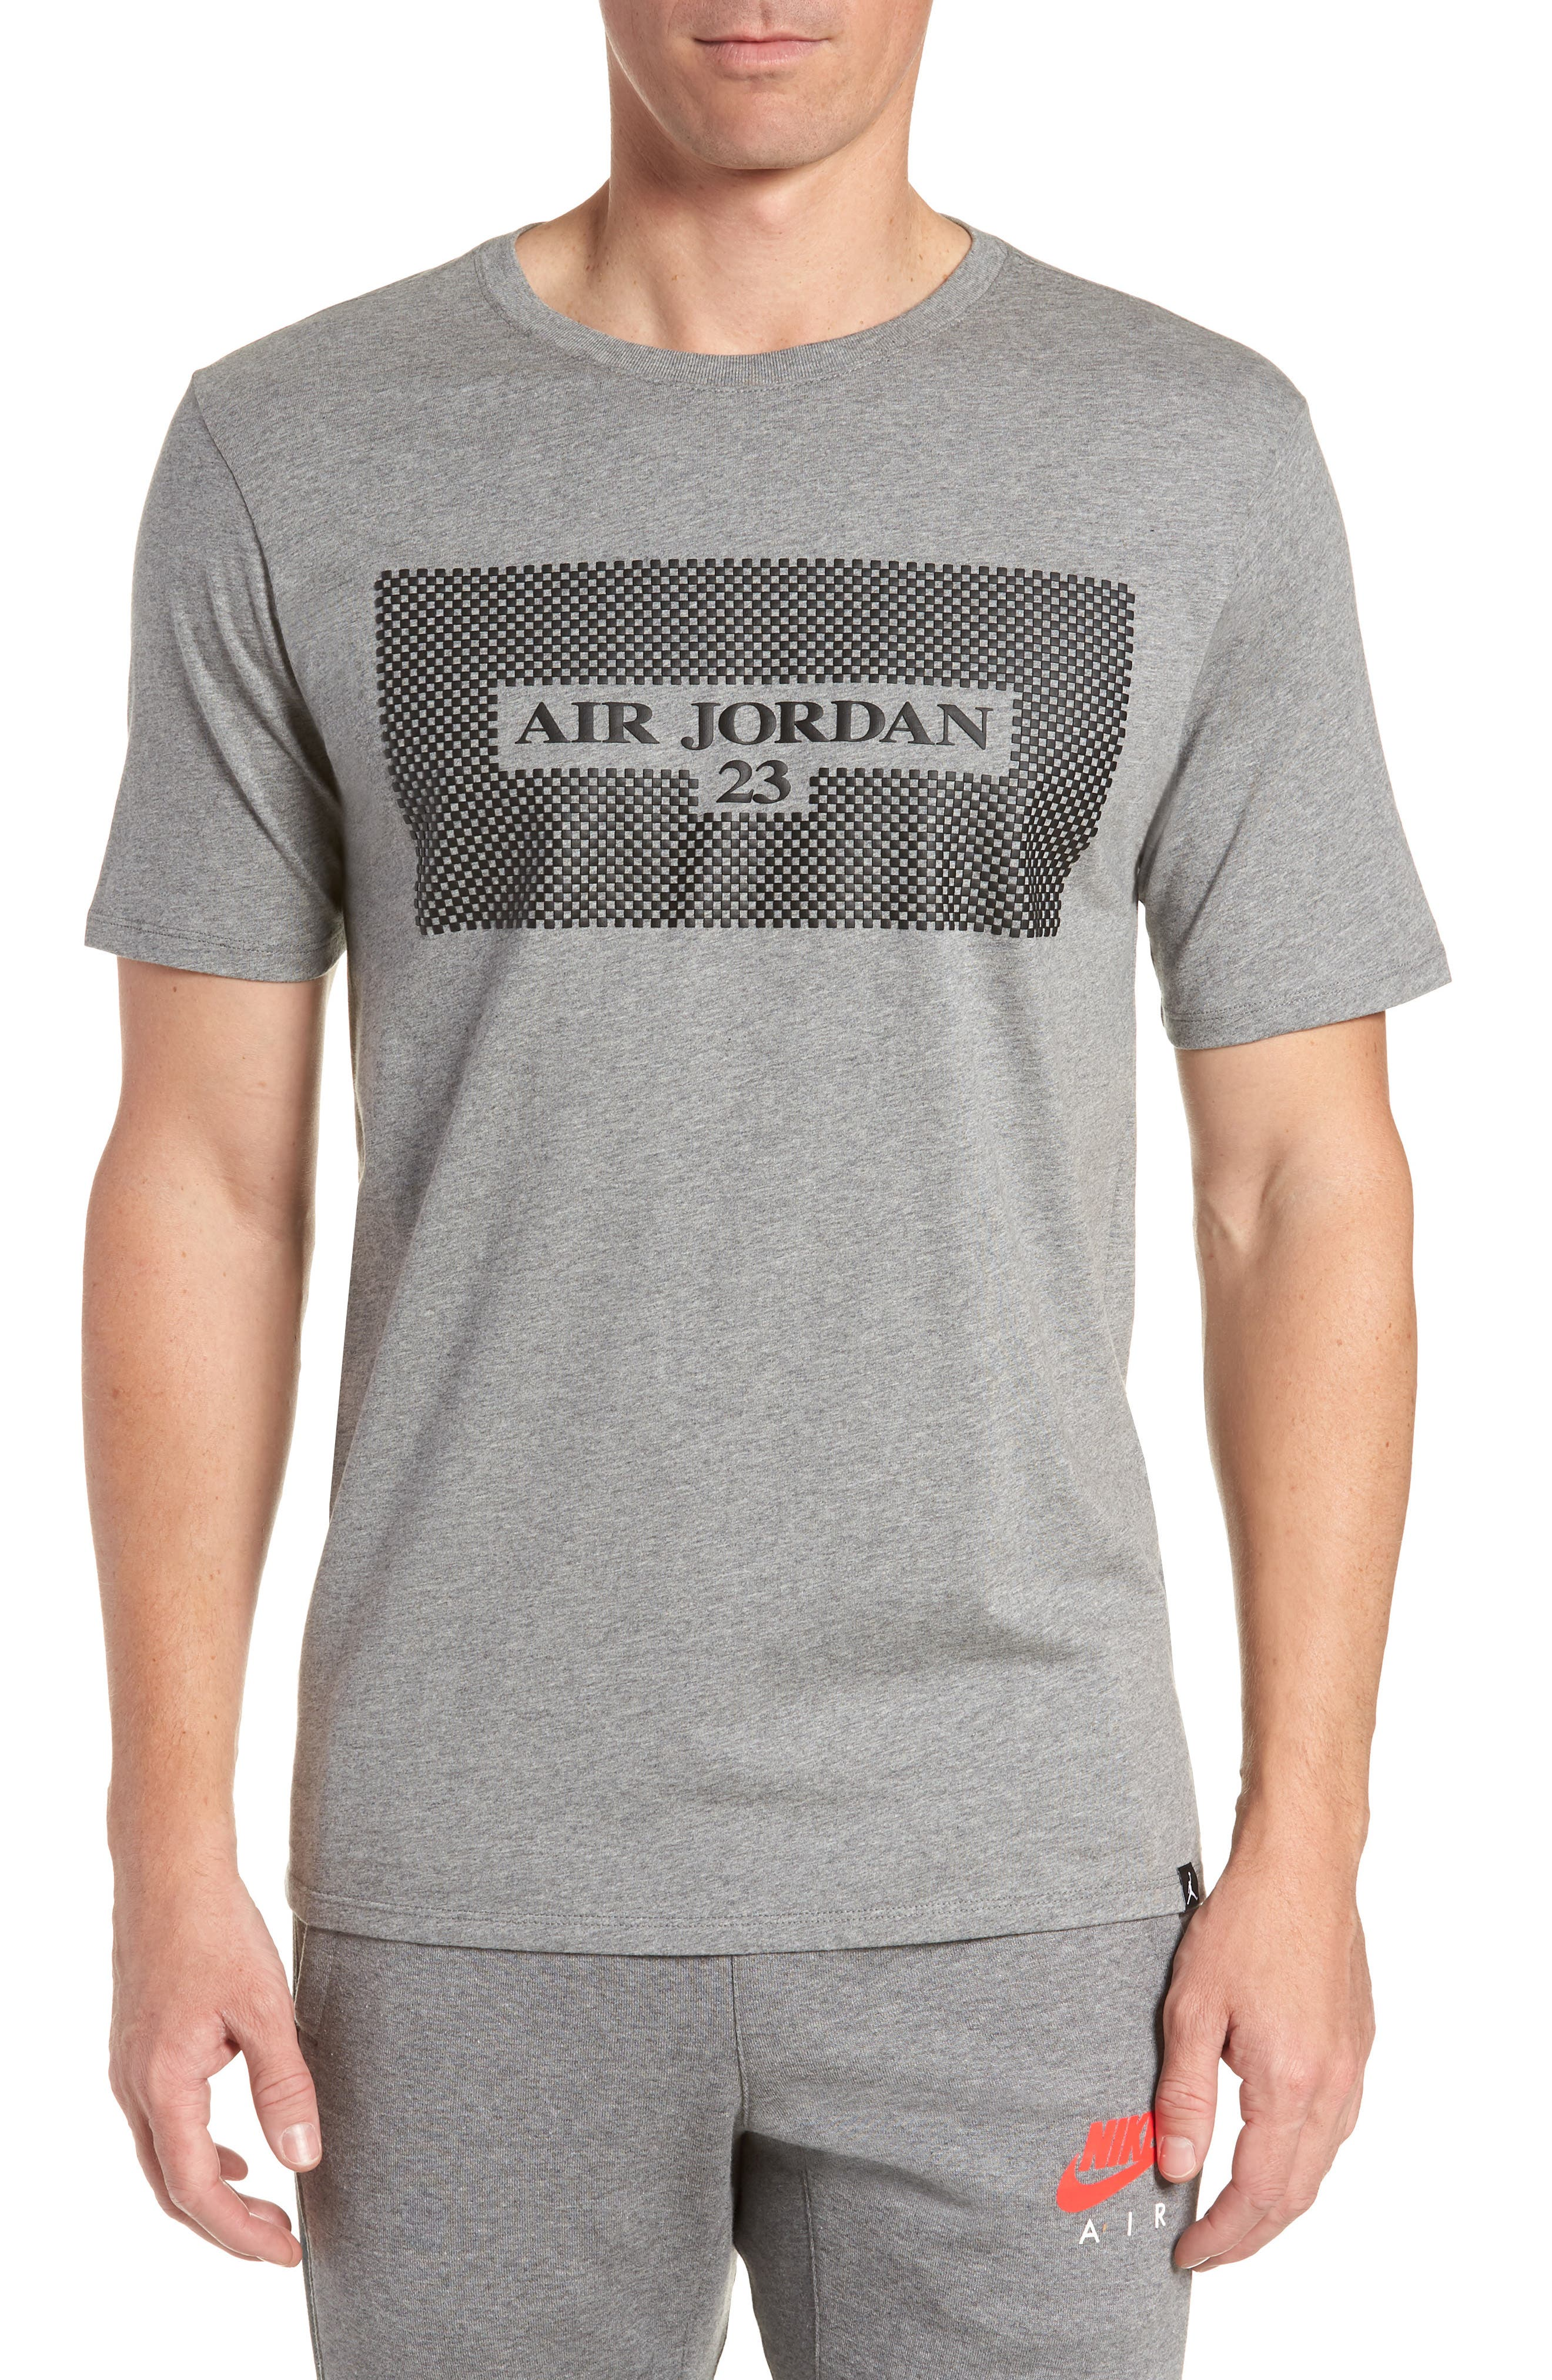 Air Jordan 23 T-Shirt,                         Main,                         color, CARBON HEATHER/ BLACK